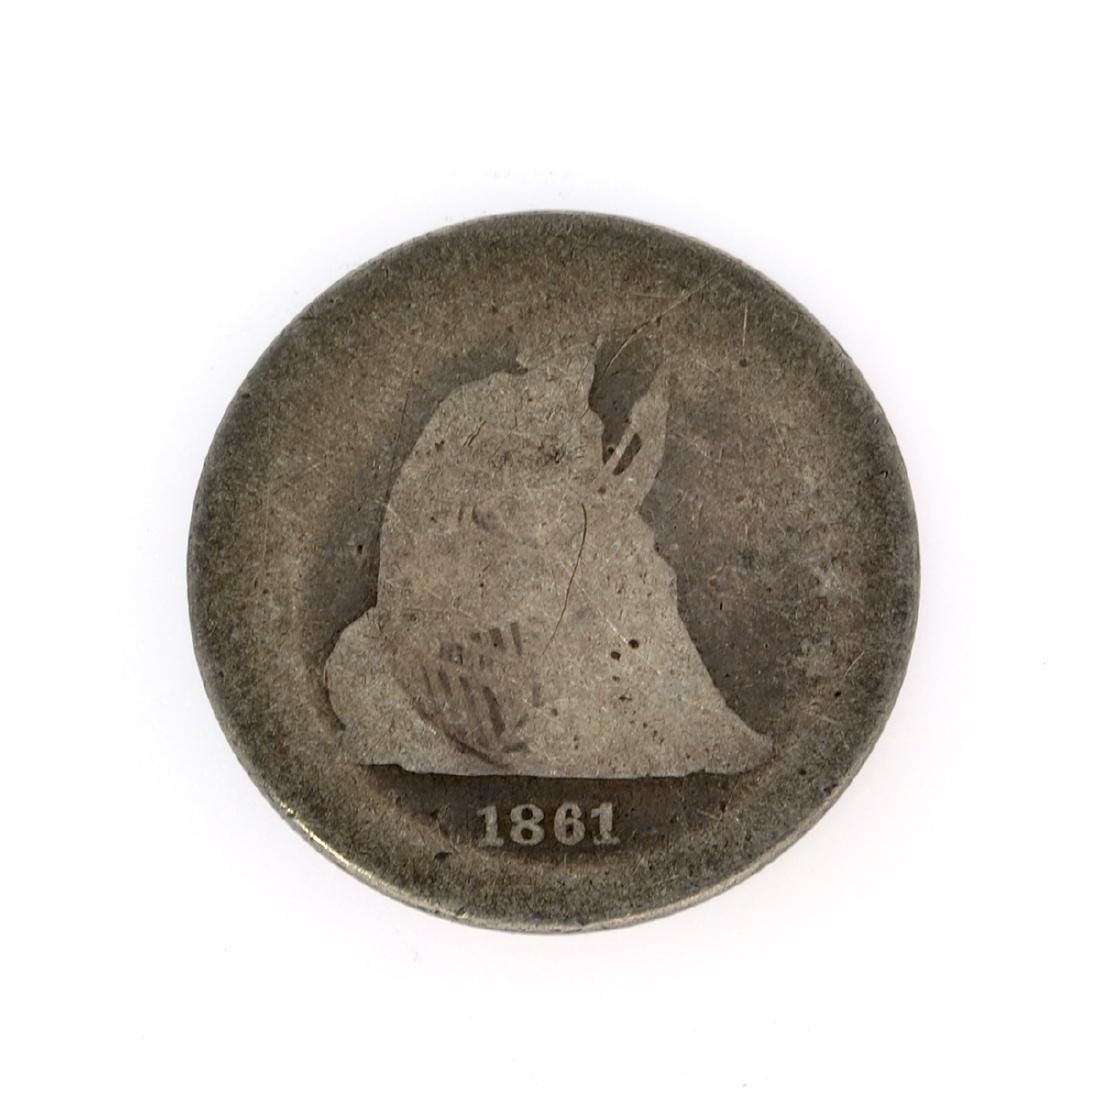 Rare 1861 Liberty Seated Quarter Dollar Coin